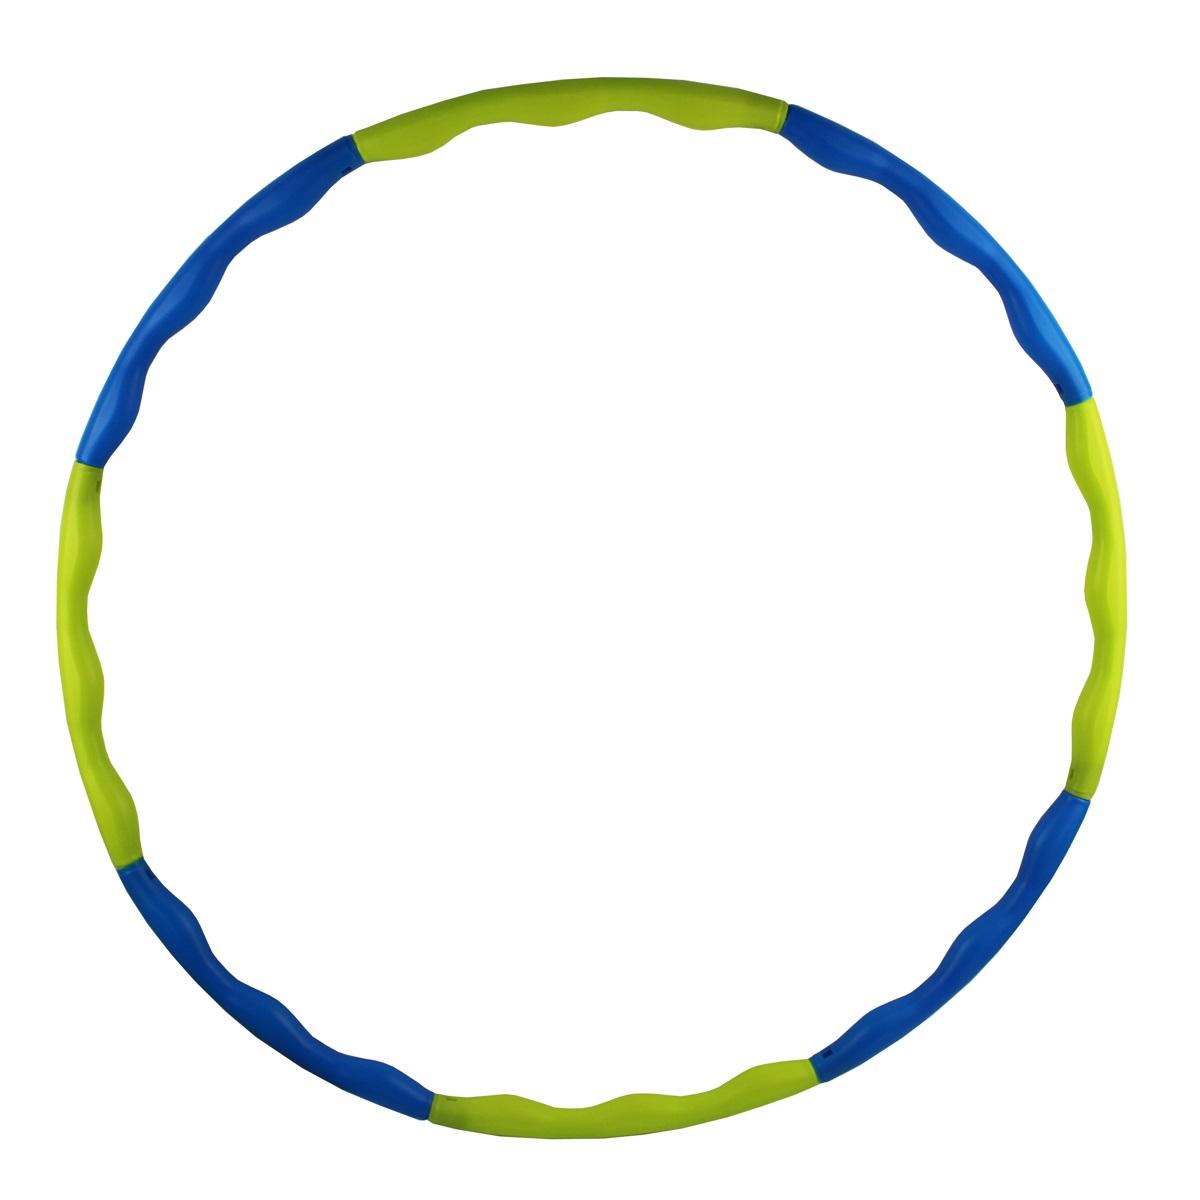 Kruh - obruč MASTER Hula Dynamic Hoop 90 cm - 500 g